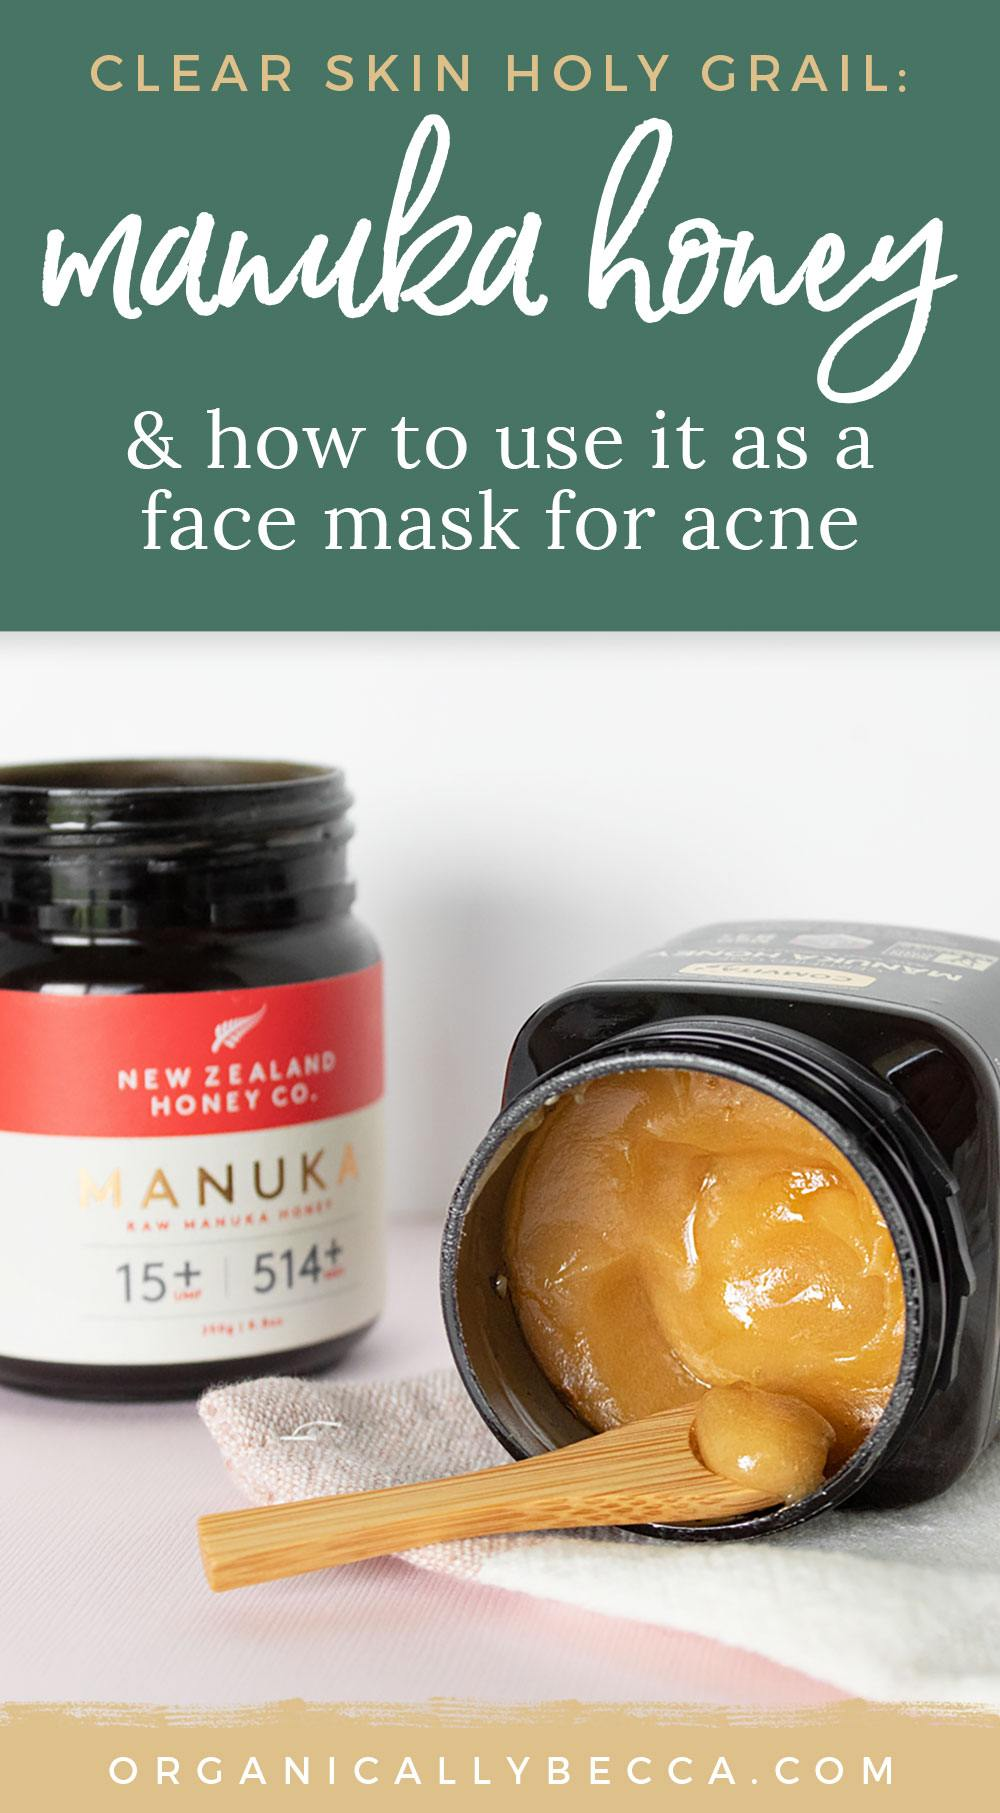 Manuka Honey Face Mask for Clear Skin